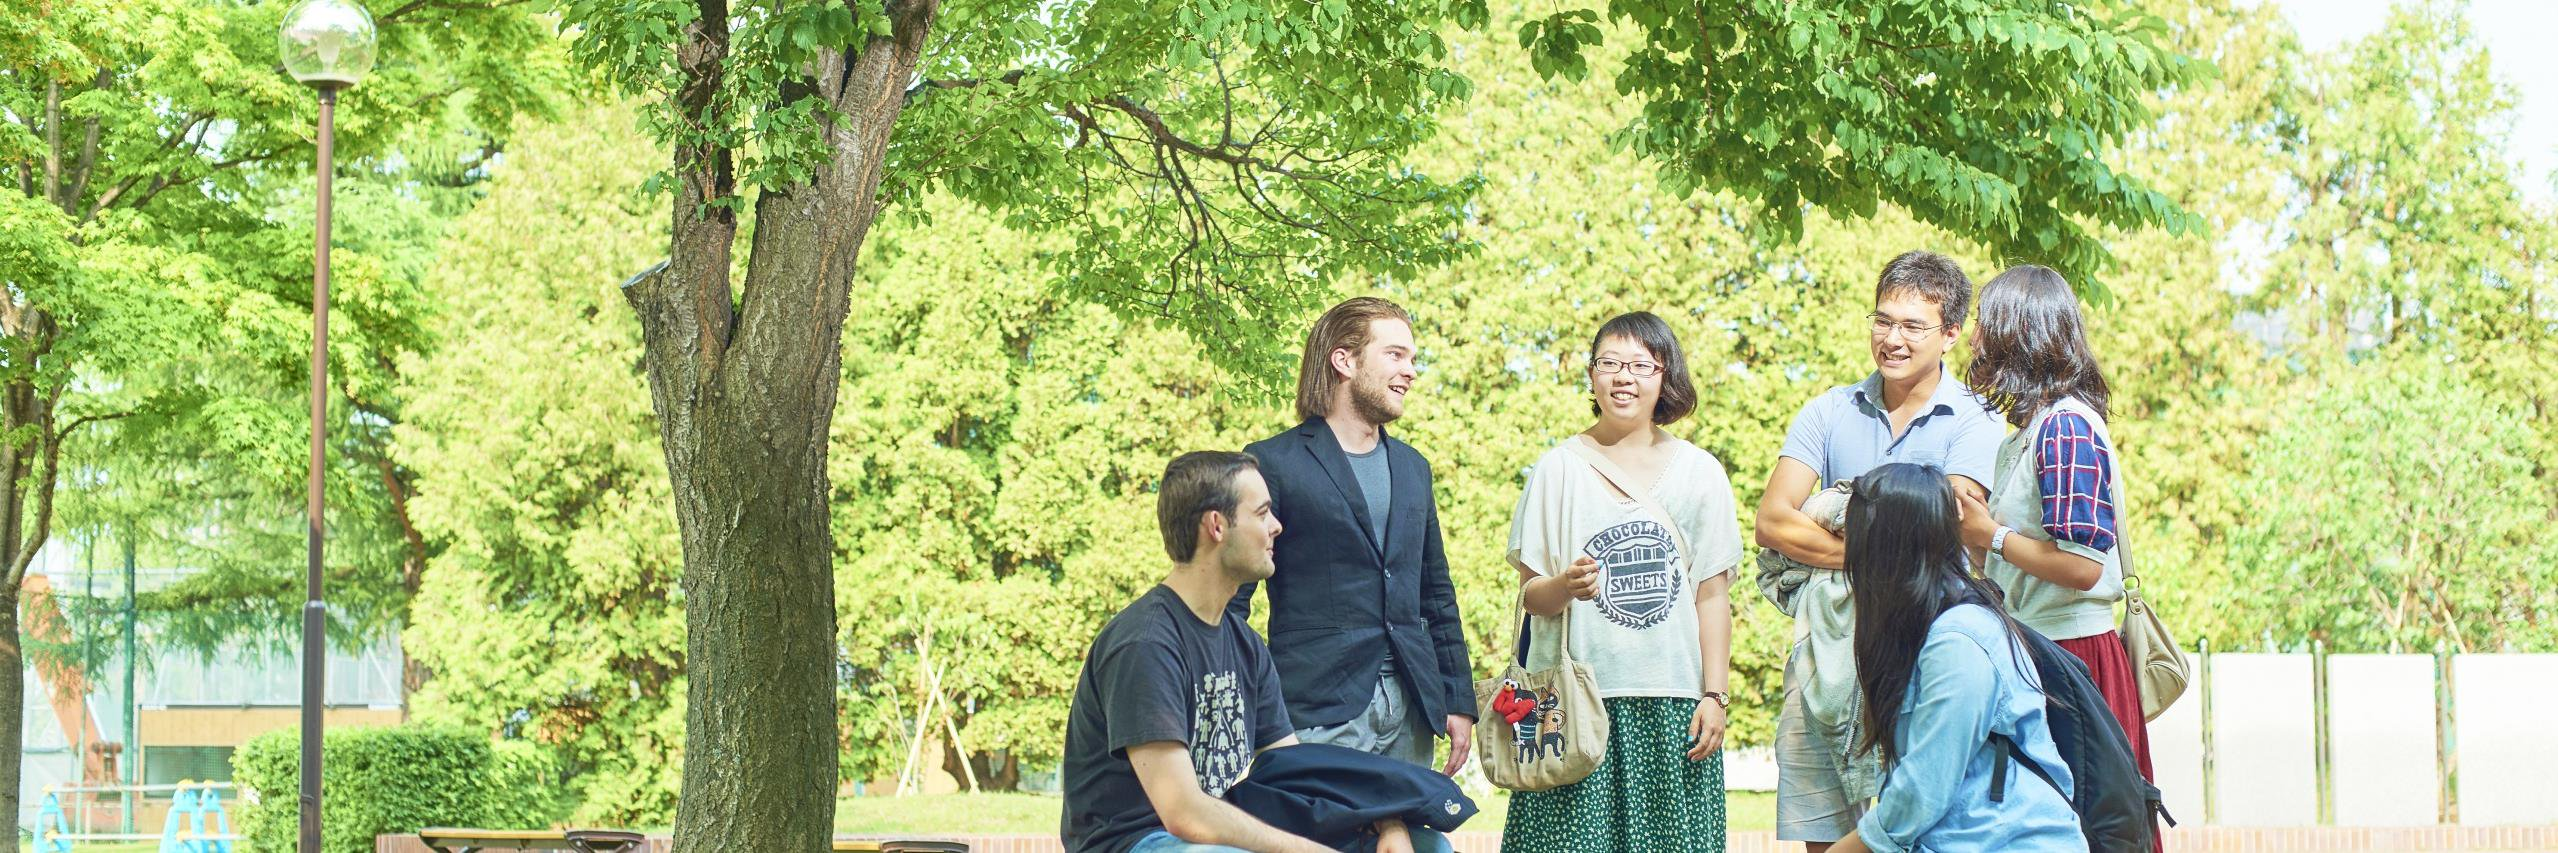 Hokusei Gakuen University's official Twitter account